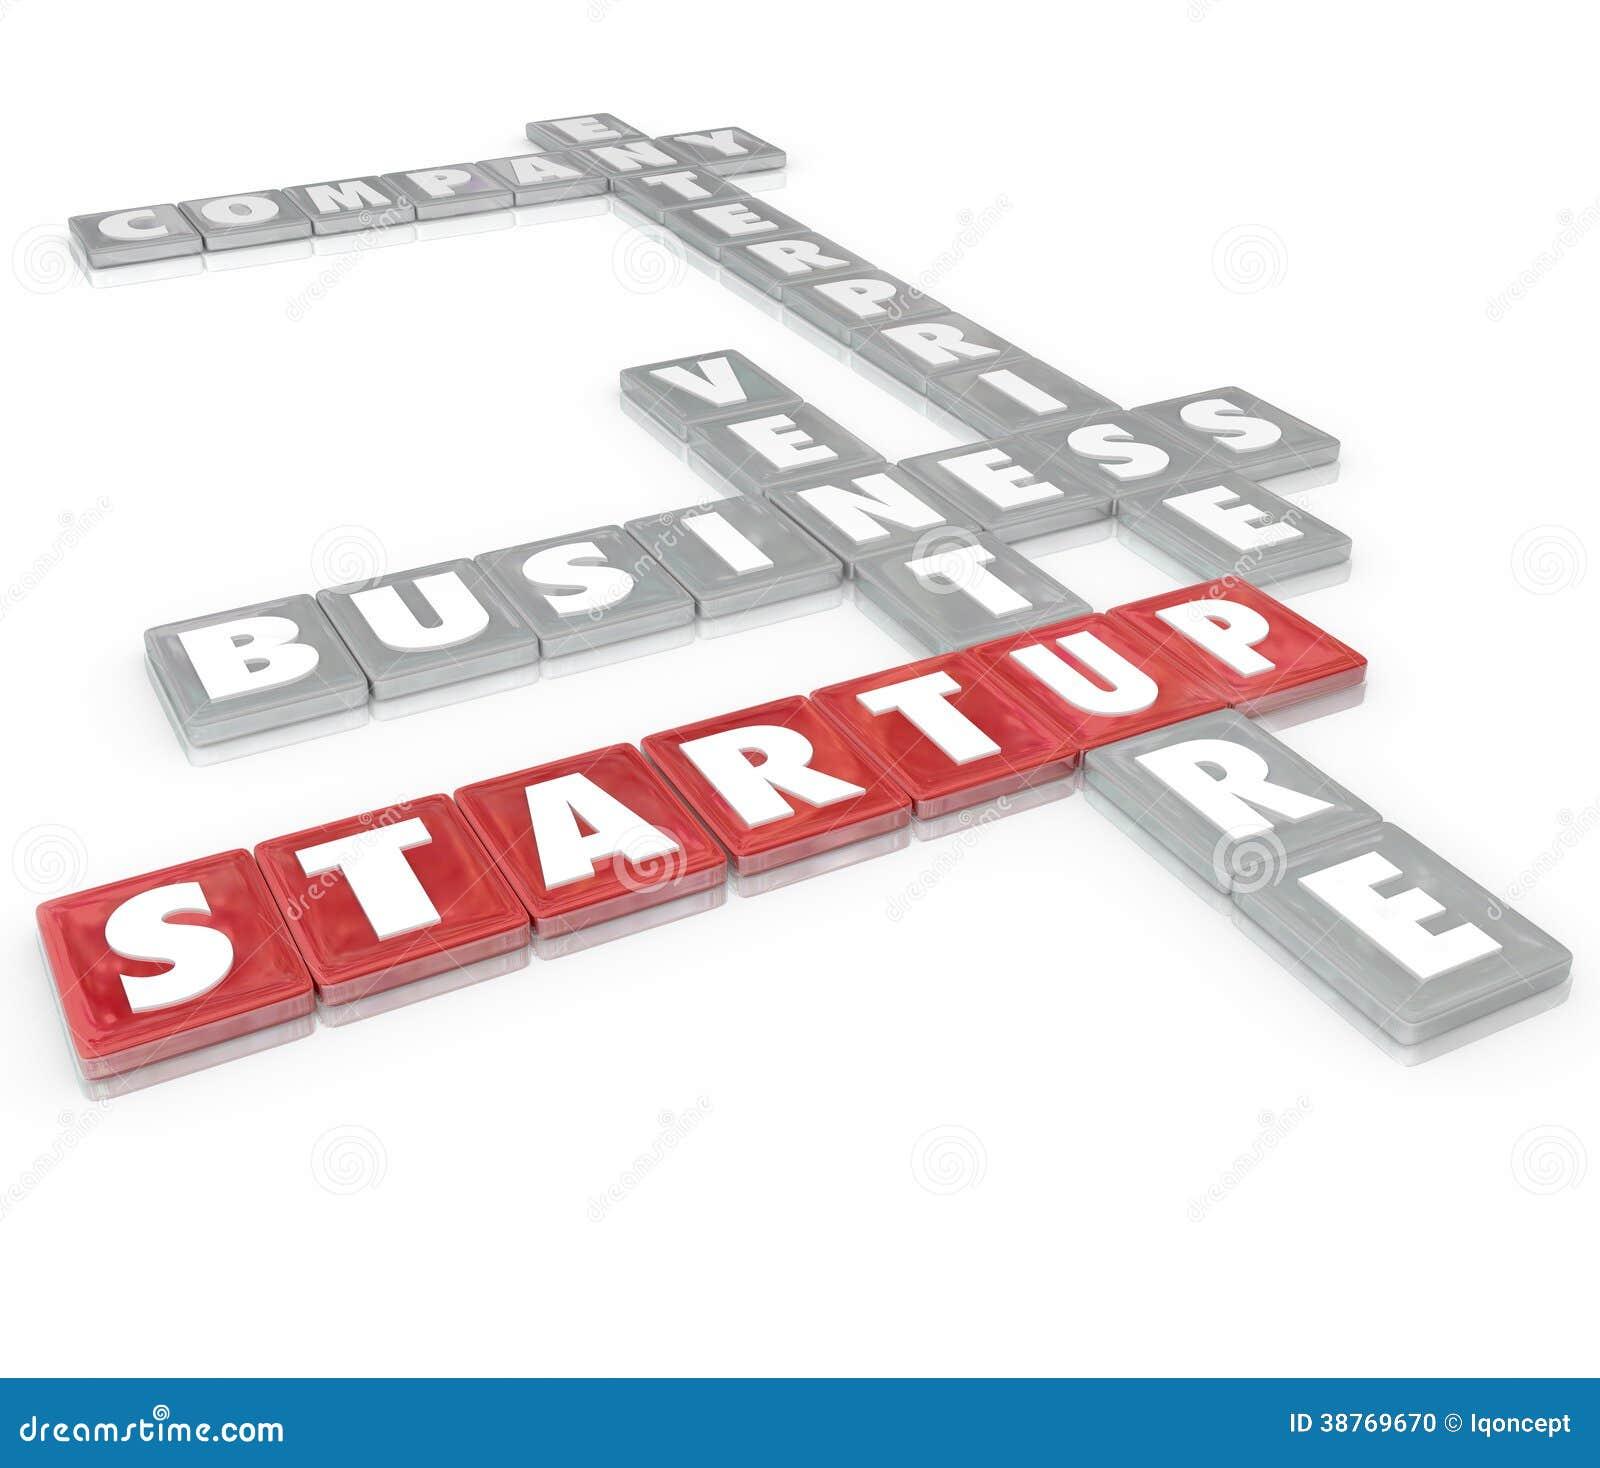 Start product company